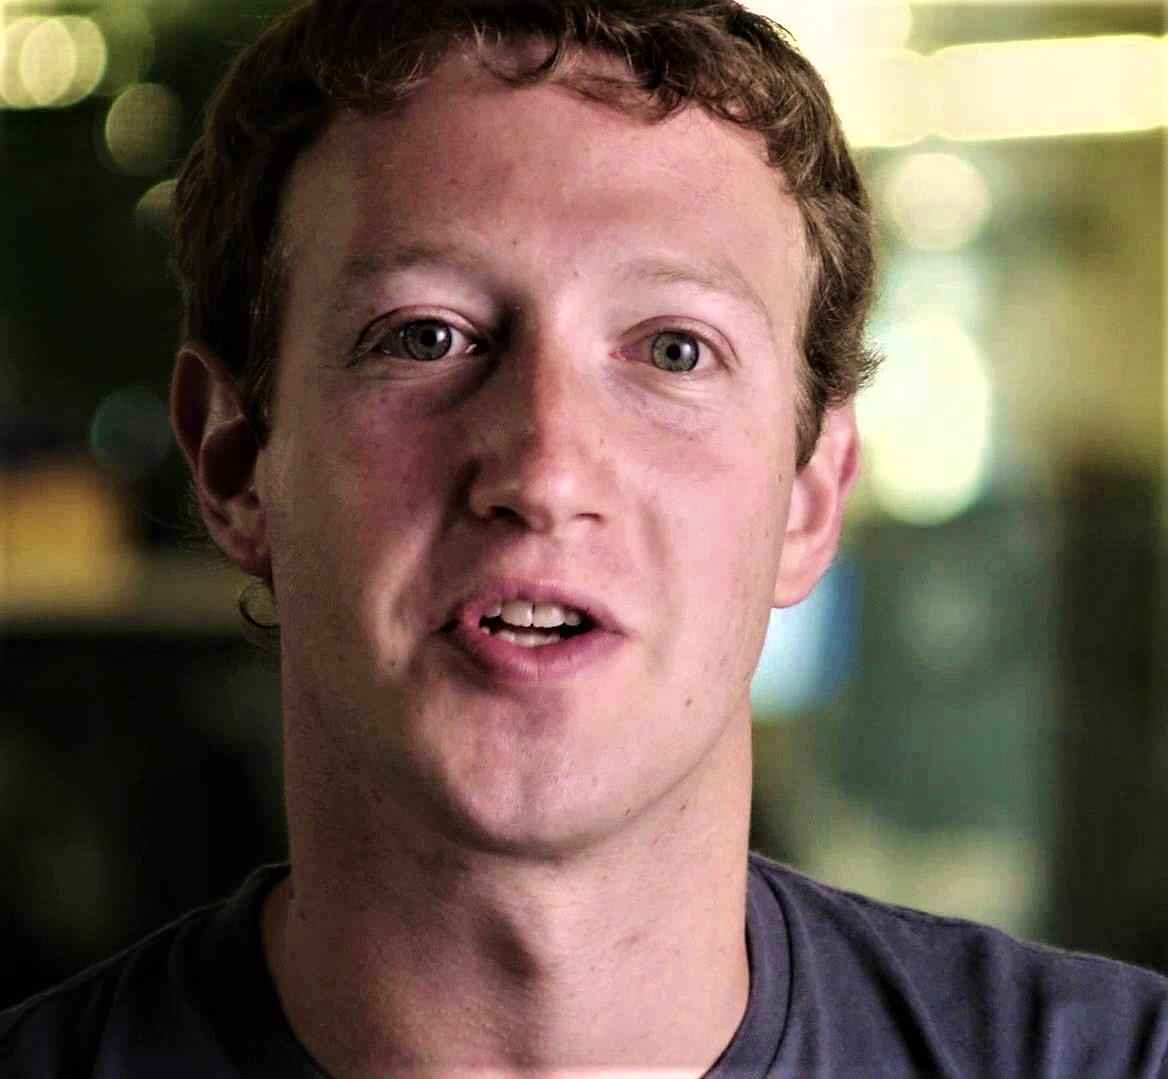 The Maturation Of Mark Zuckerberg New York Magazine: Poet Red Shuttleworth